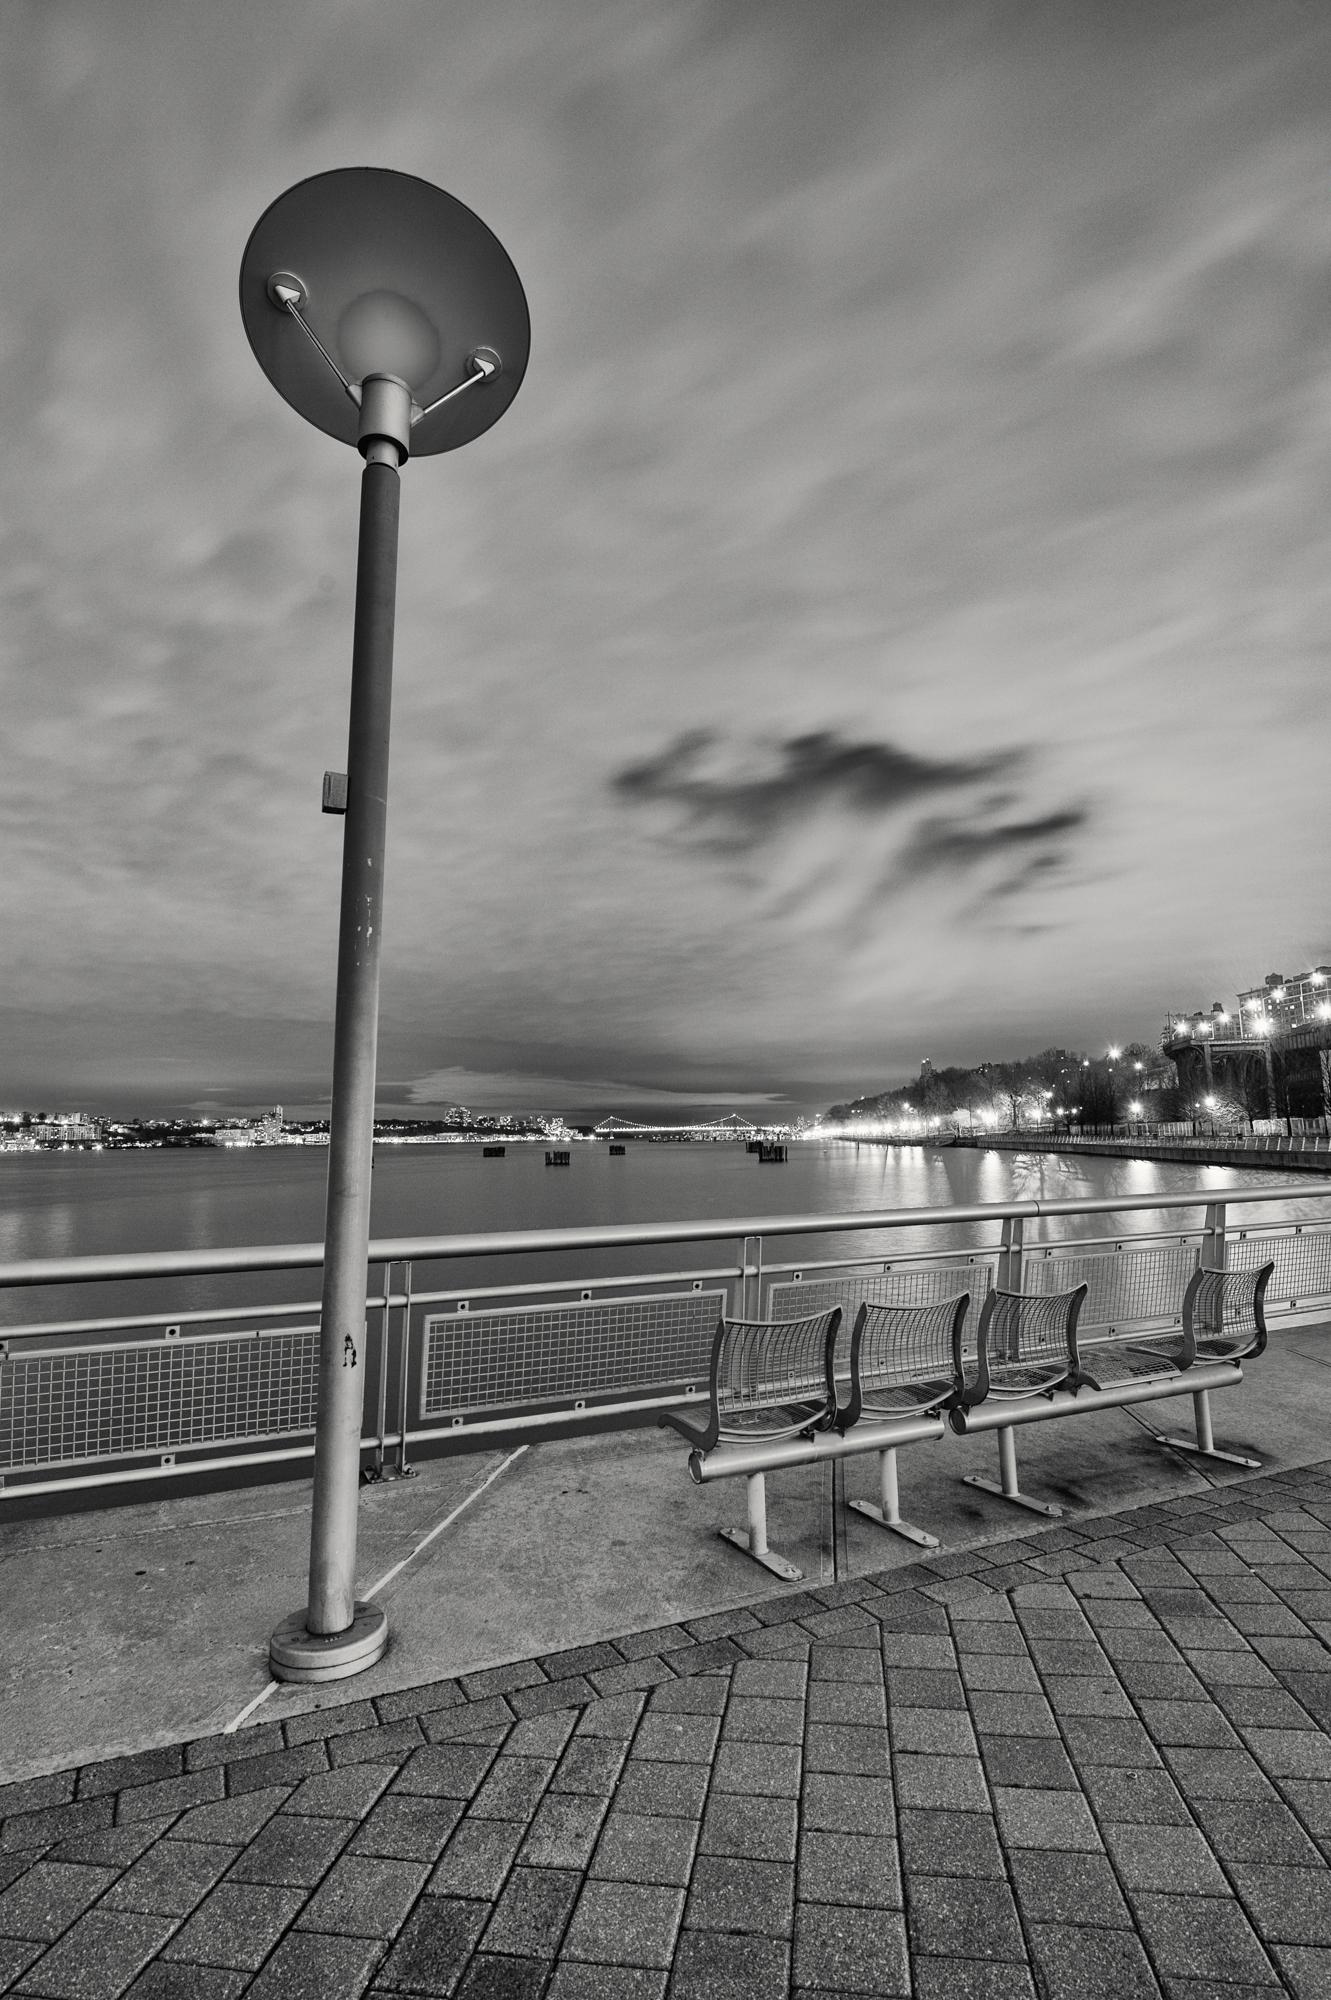 70th St Pier, Hudson River, NY